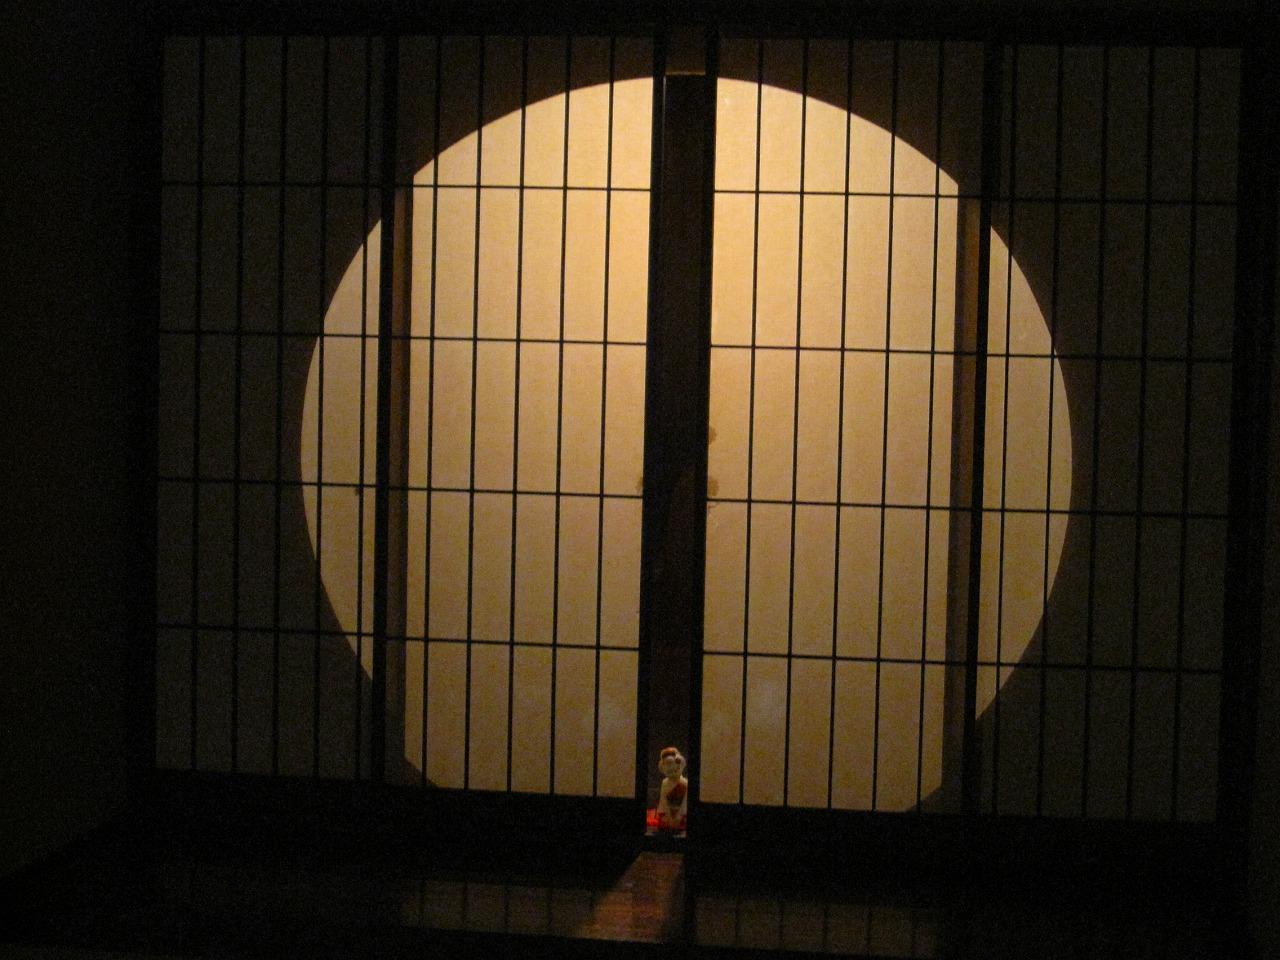 http://www.kawagoe.com/ichige/ichige-blog/IMG_1237.jpg